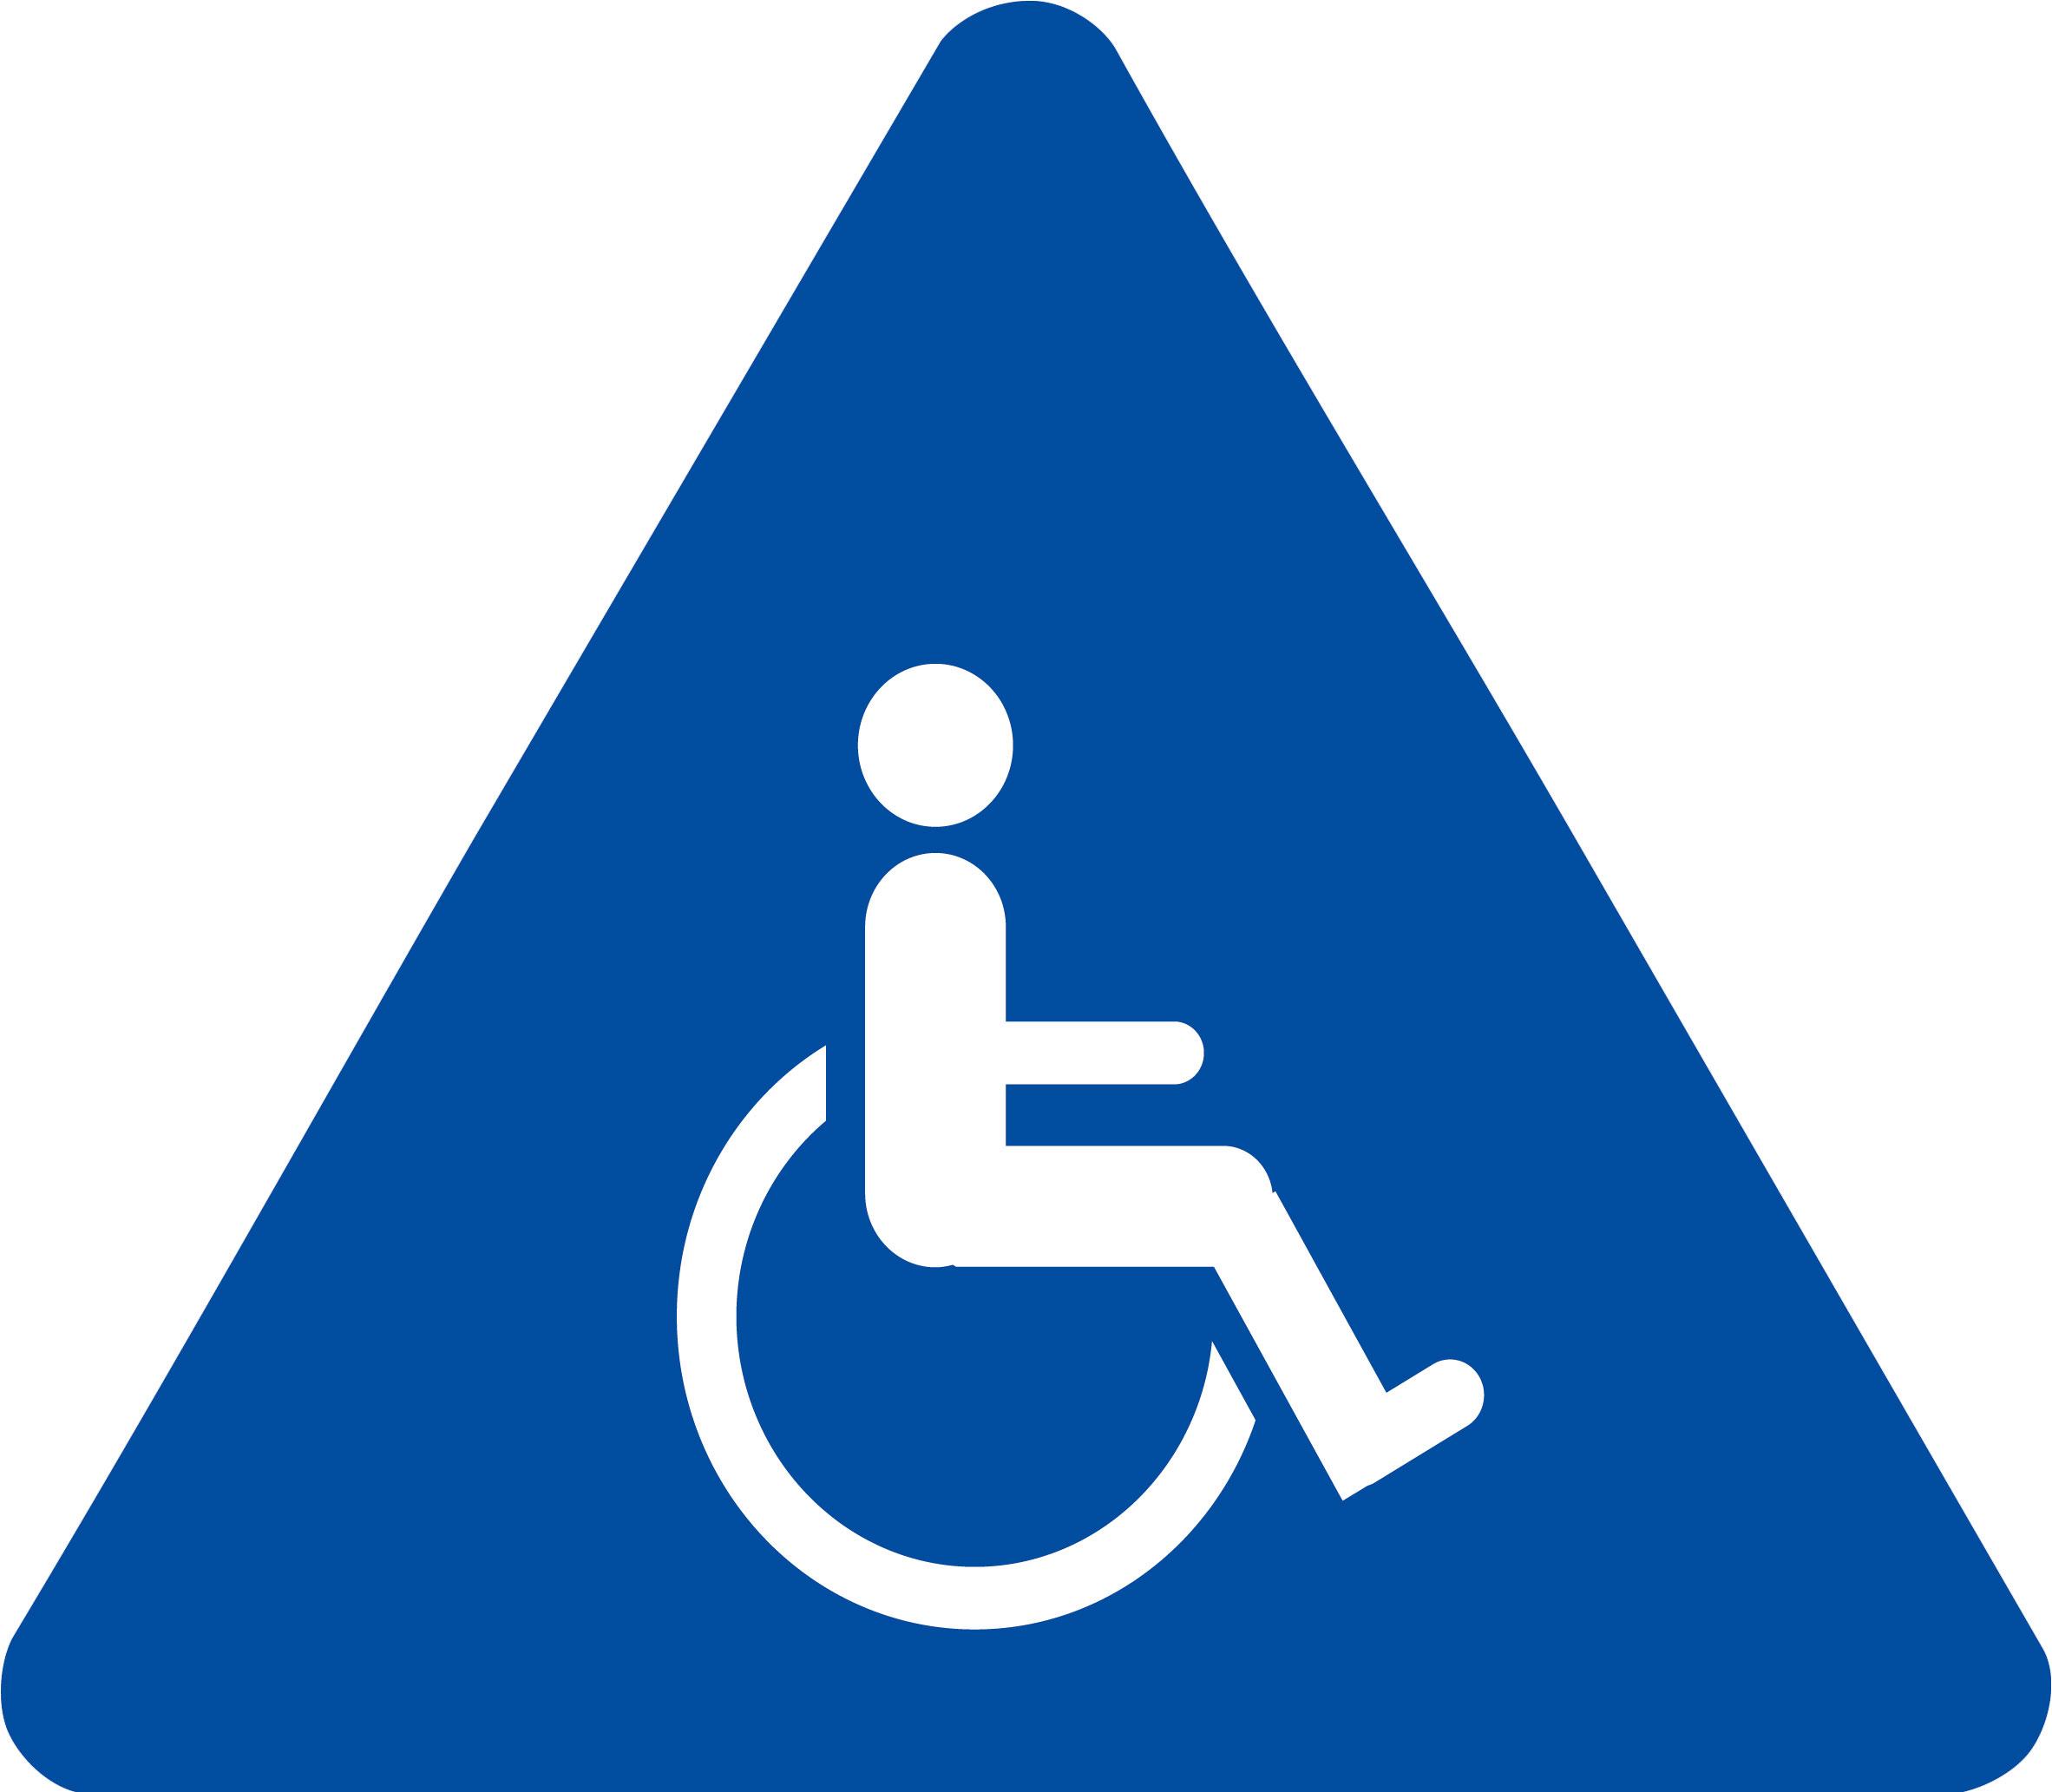 Roadway Safety Trigonal Traffic Signs And Symbols 3m Avery Oem